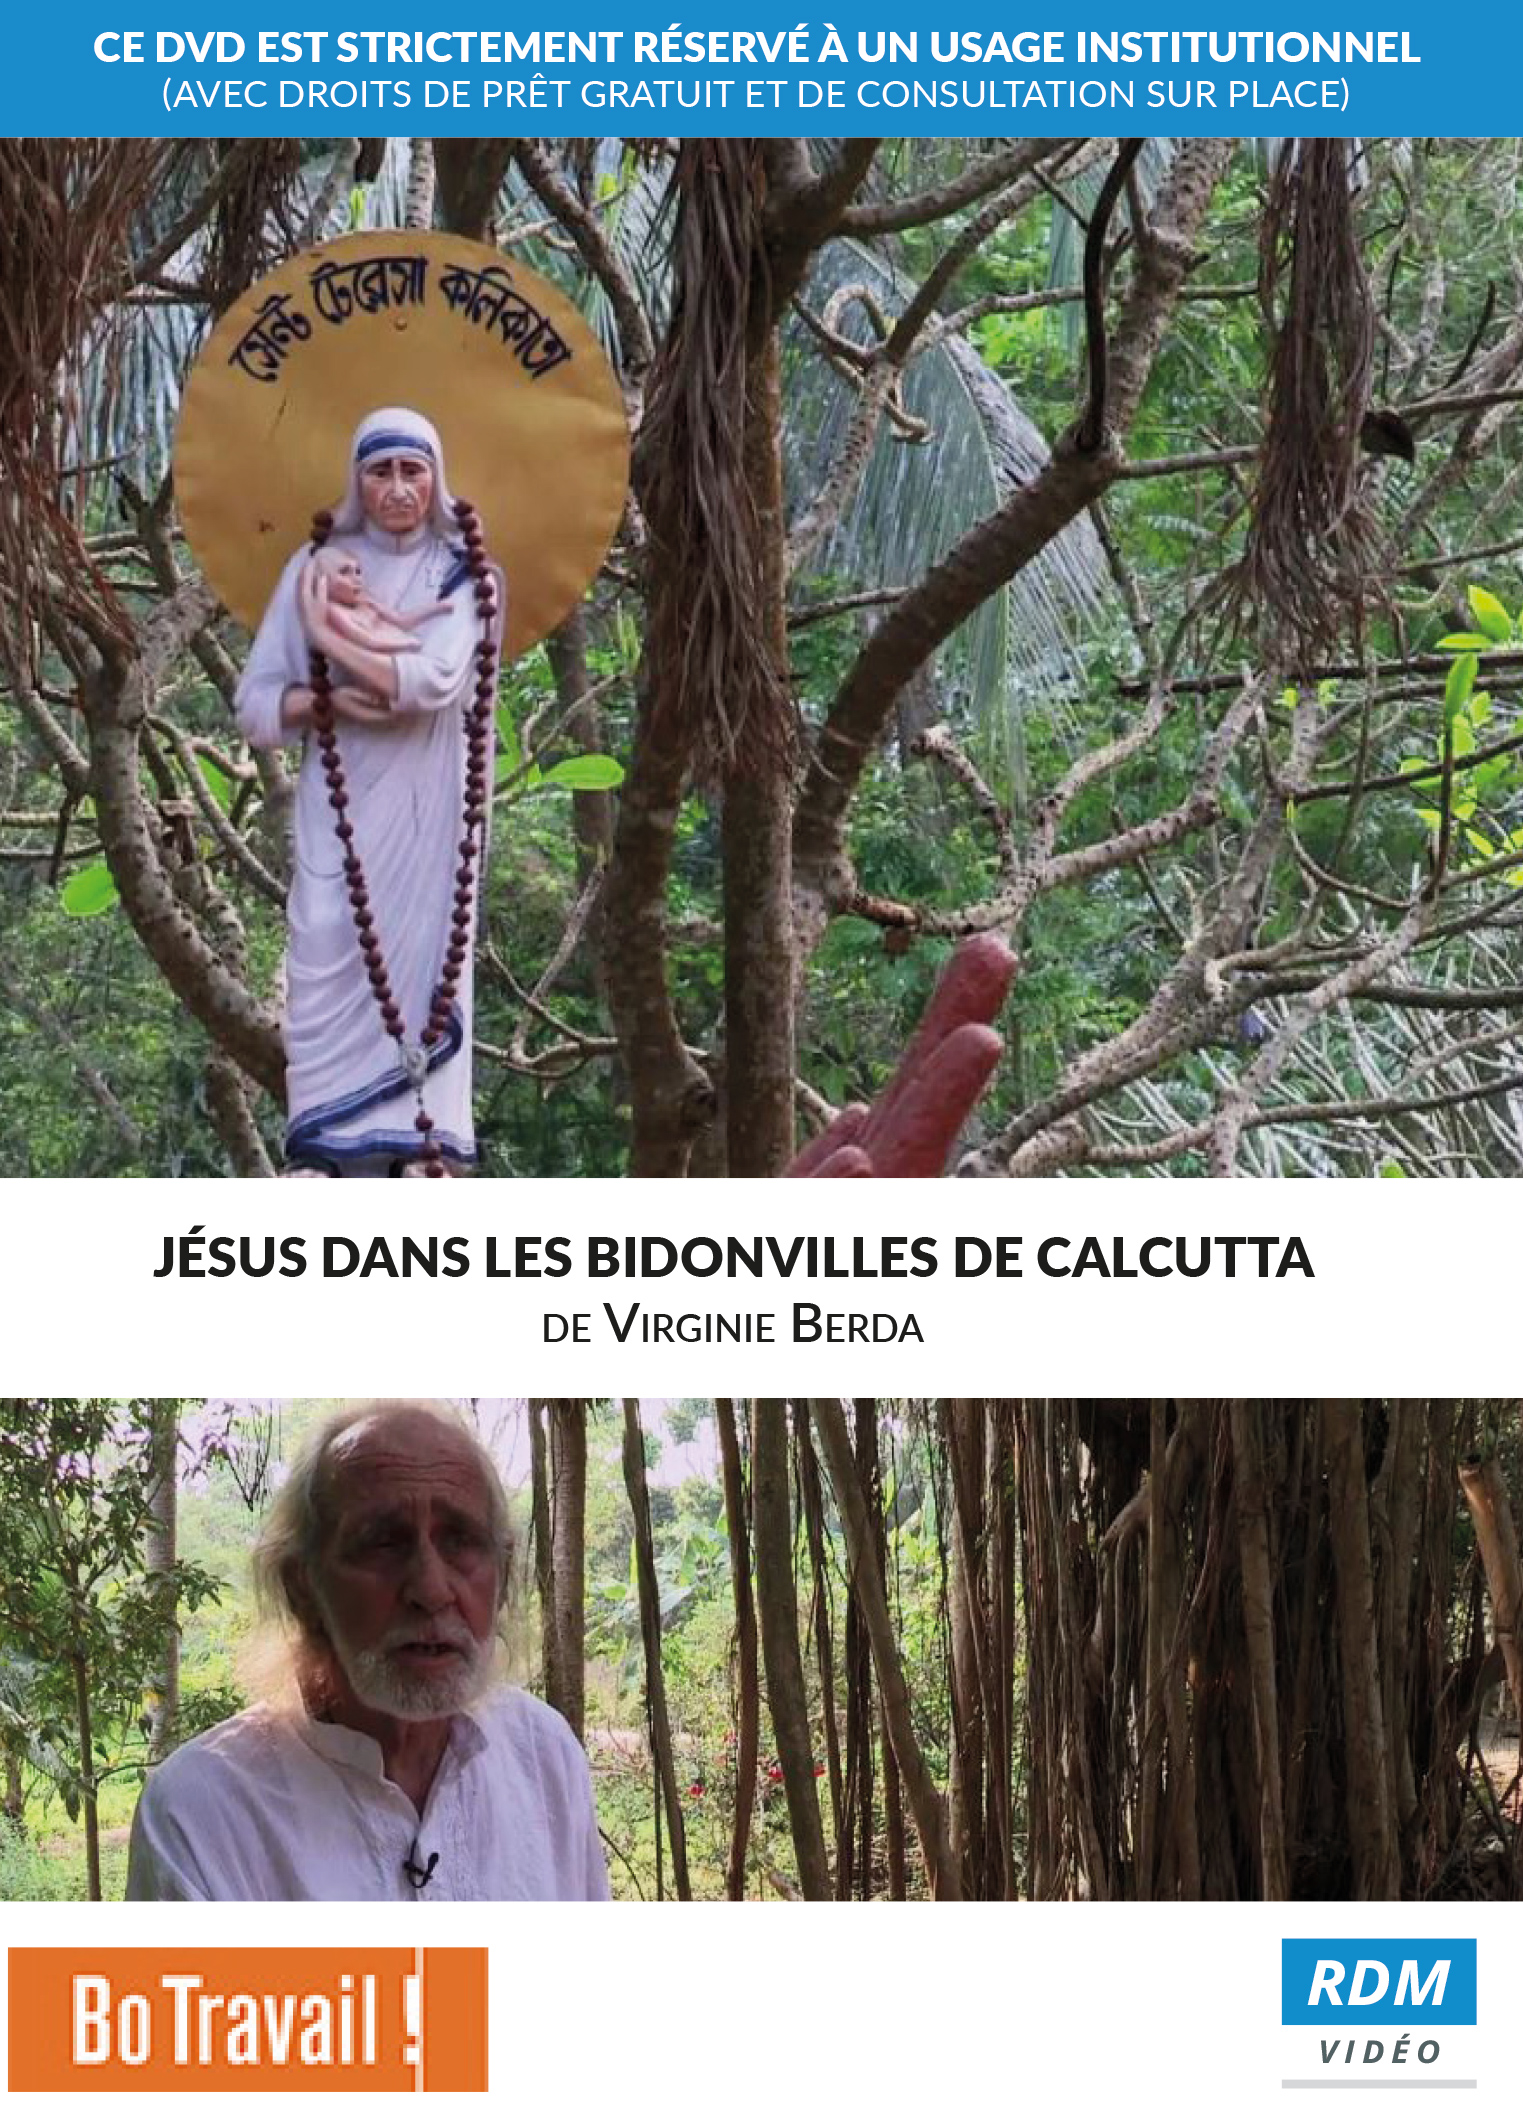 Jésus dans les bidonvilles de Calcutta